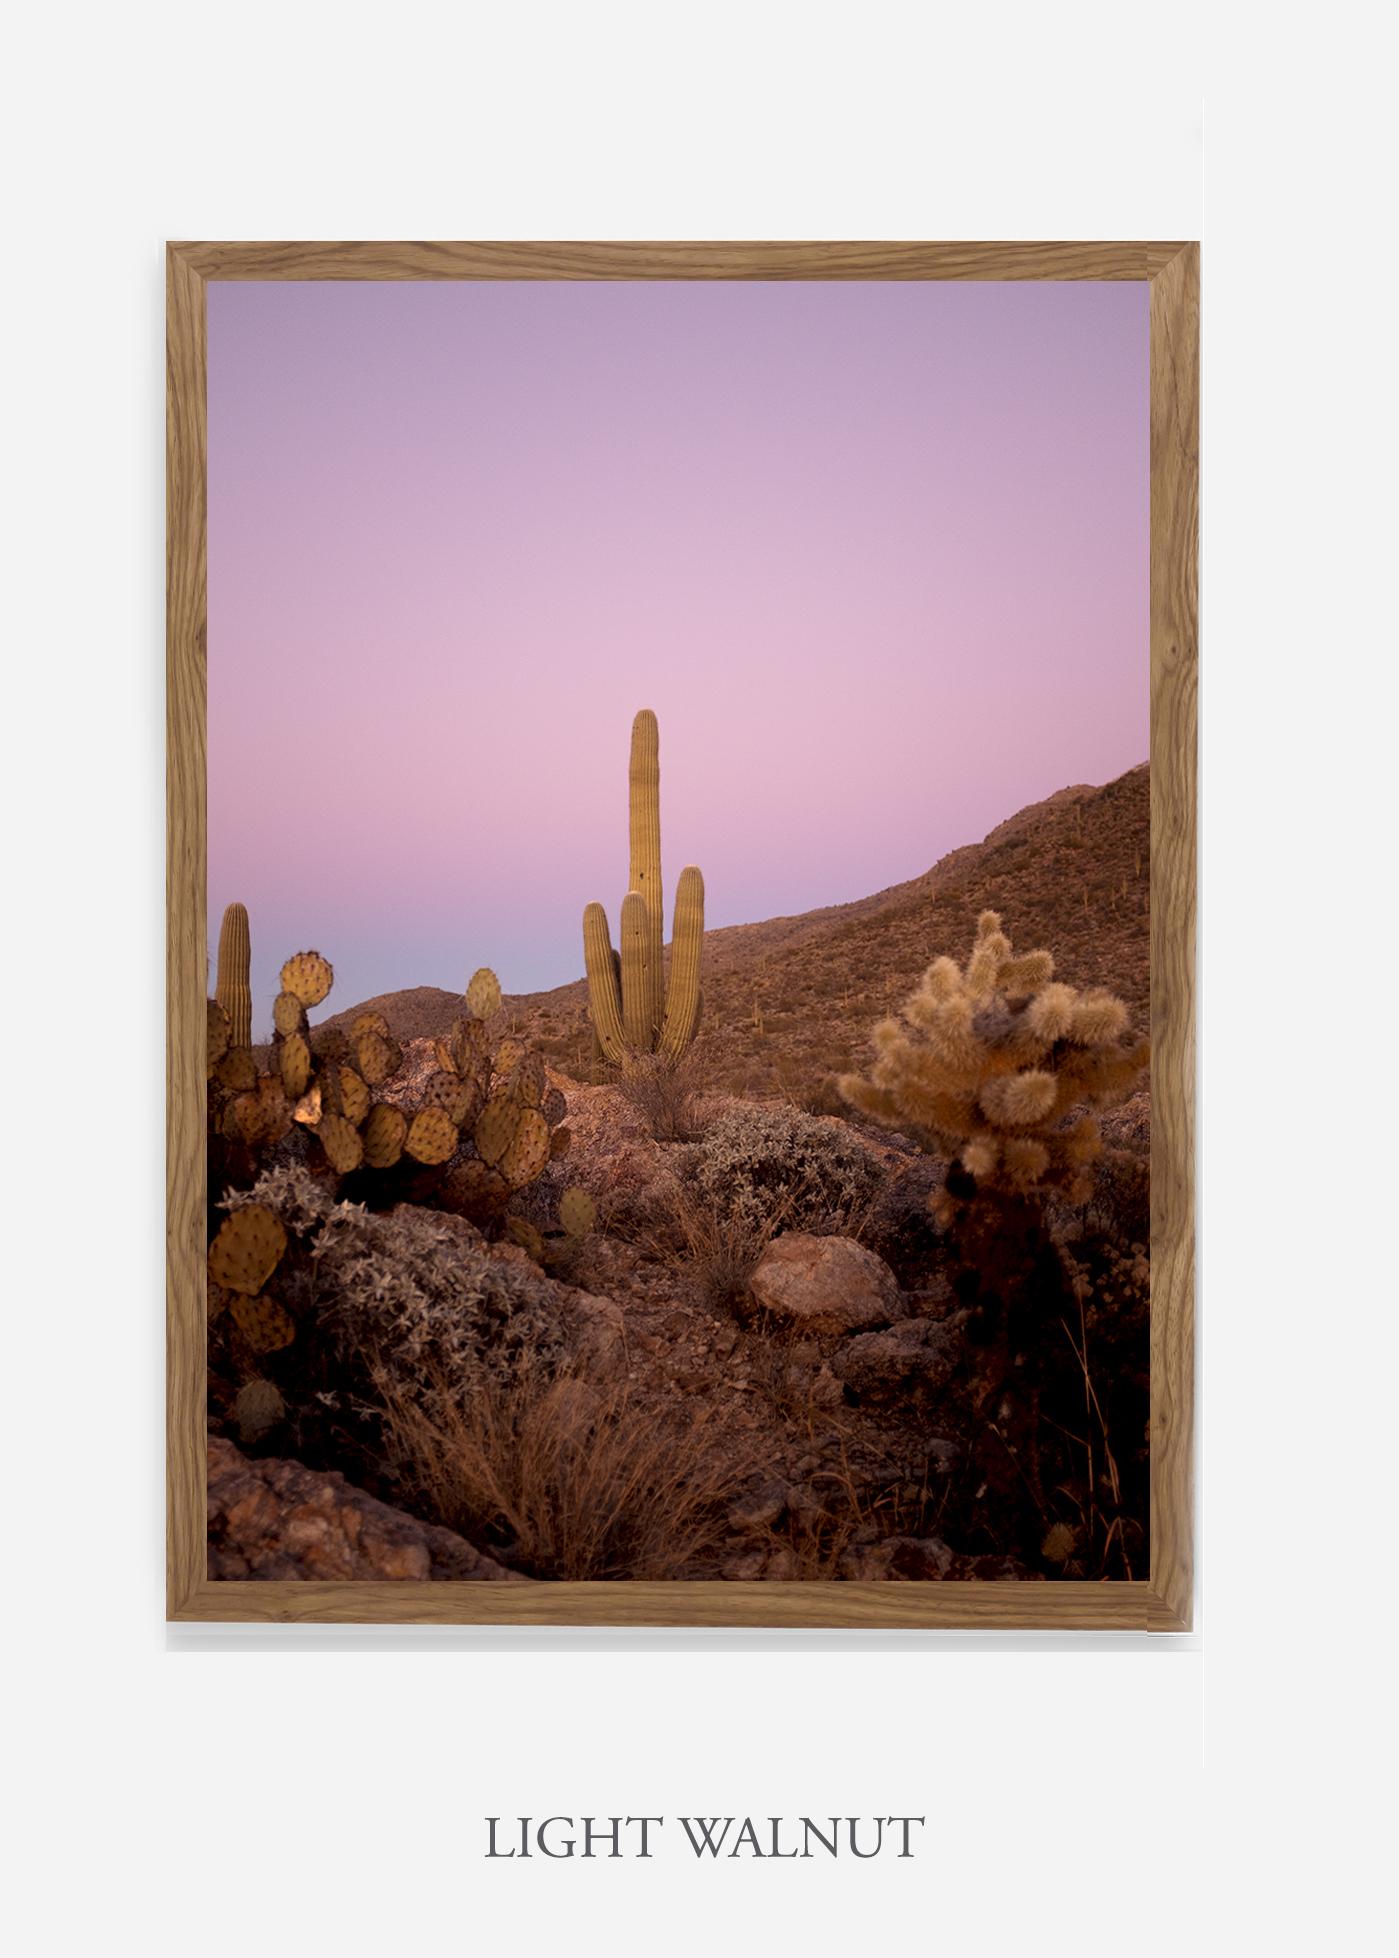 nomat-lightwalnutframe-saguaroNo.10-wildercalifornia-art-wallart-cactusprint-homedecor-prints-arizona-botanical-artwork-interiordesign.jpg